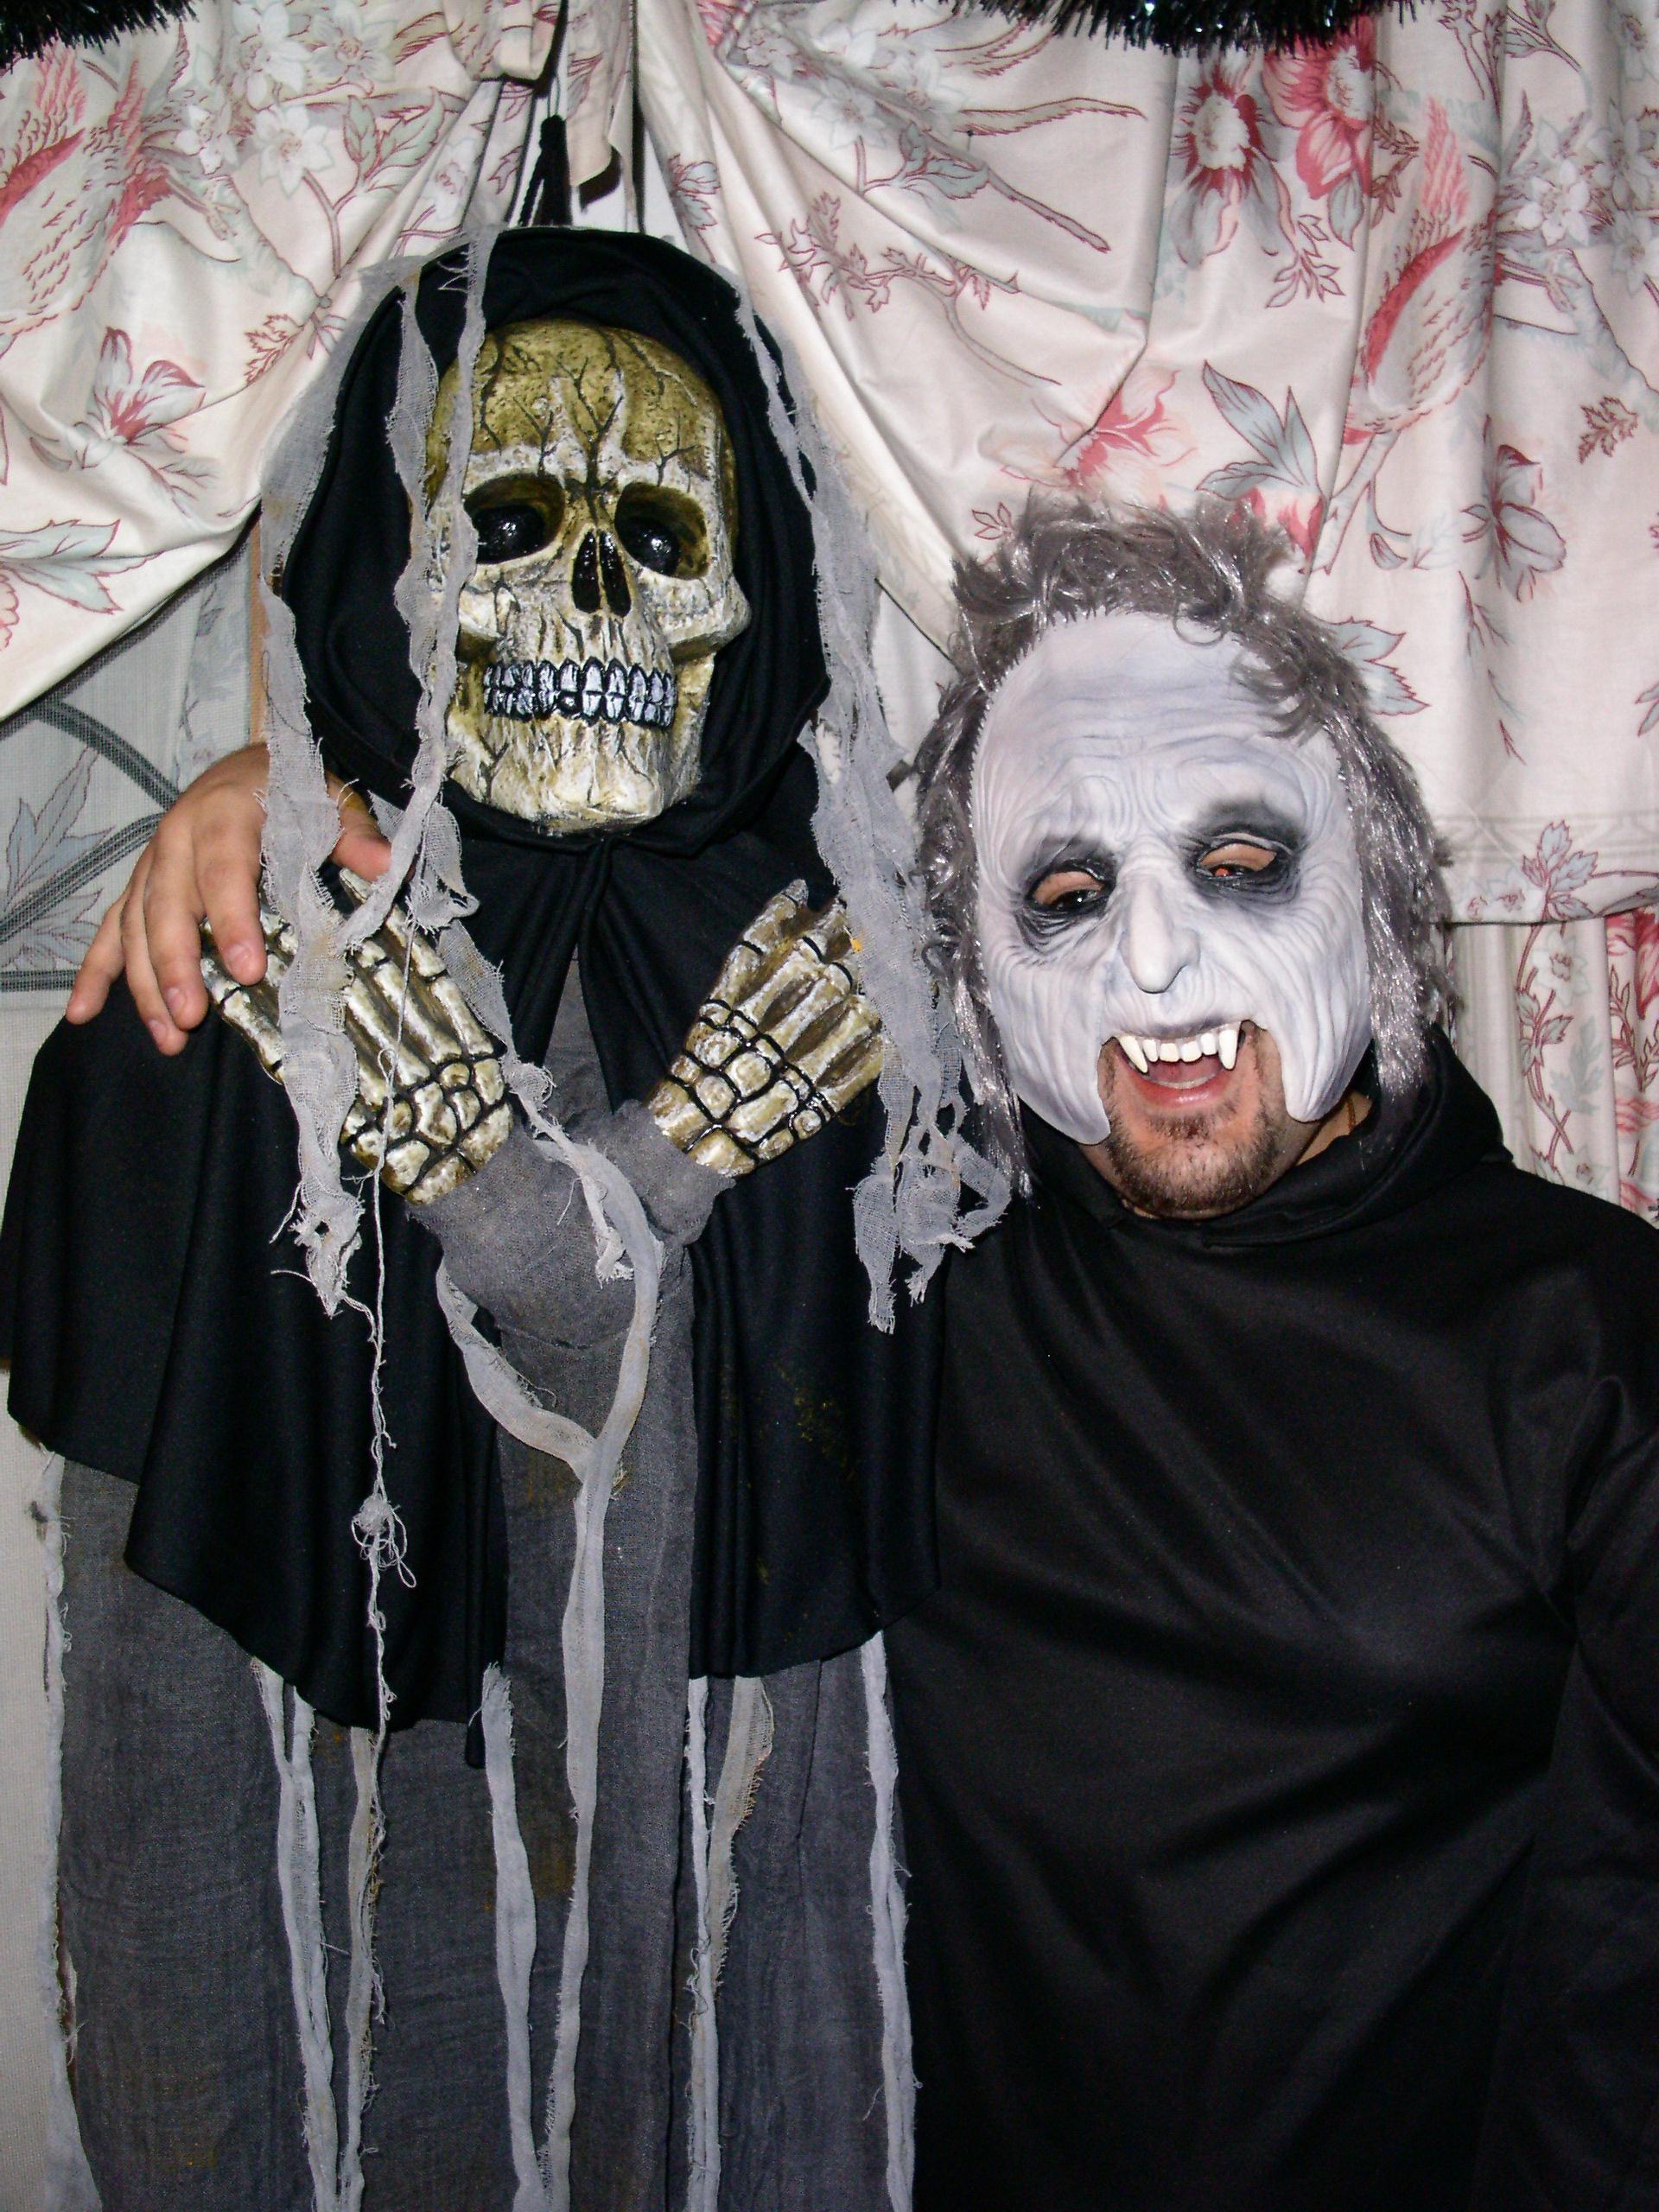 ab74382690a Halloween - Wikiquote